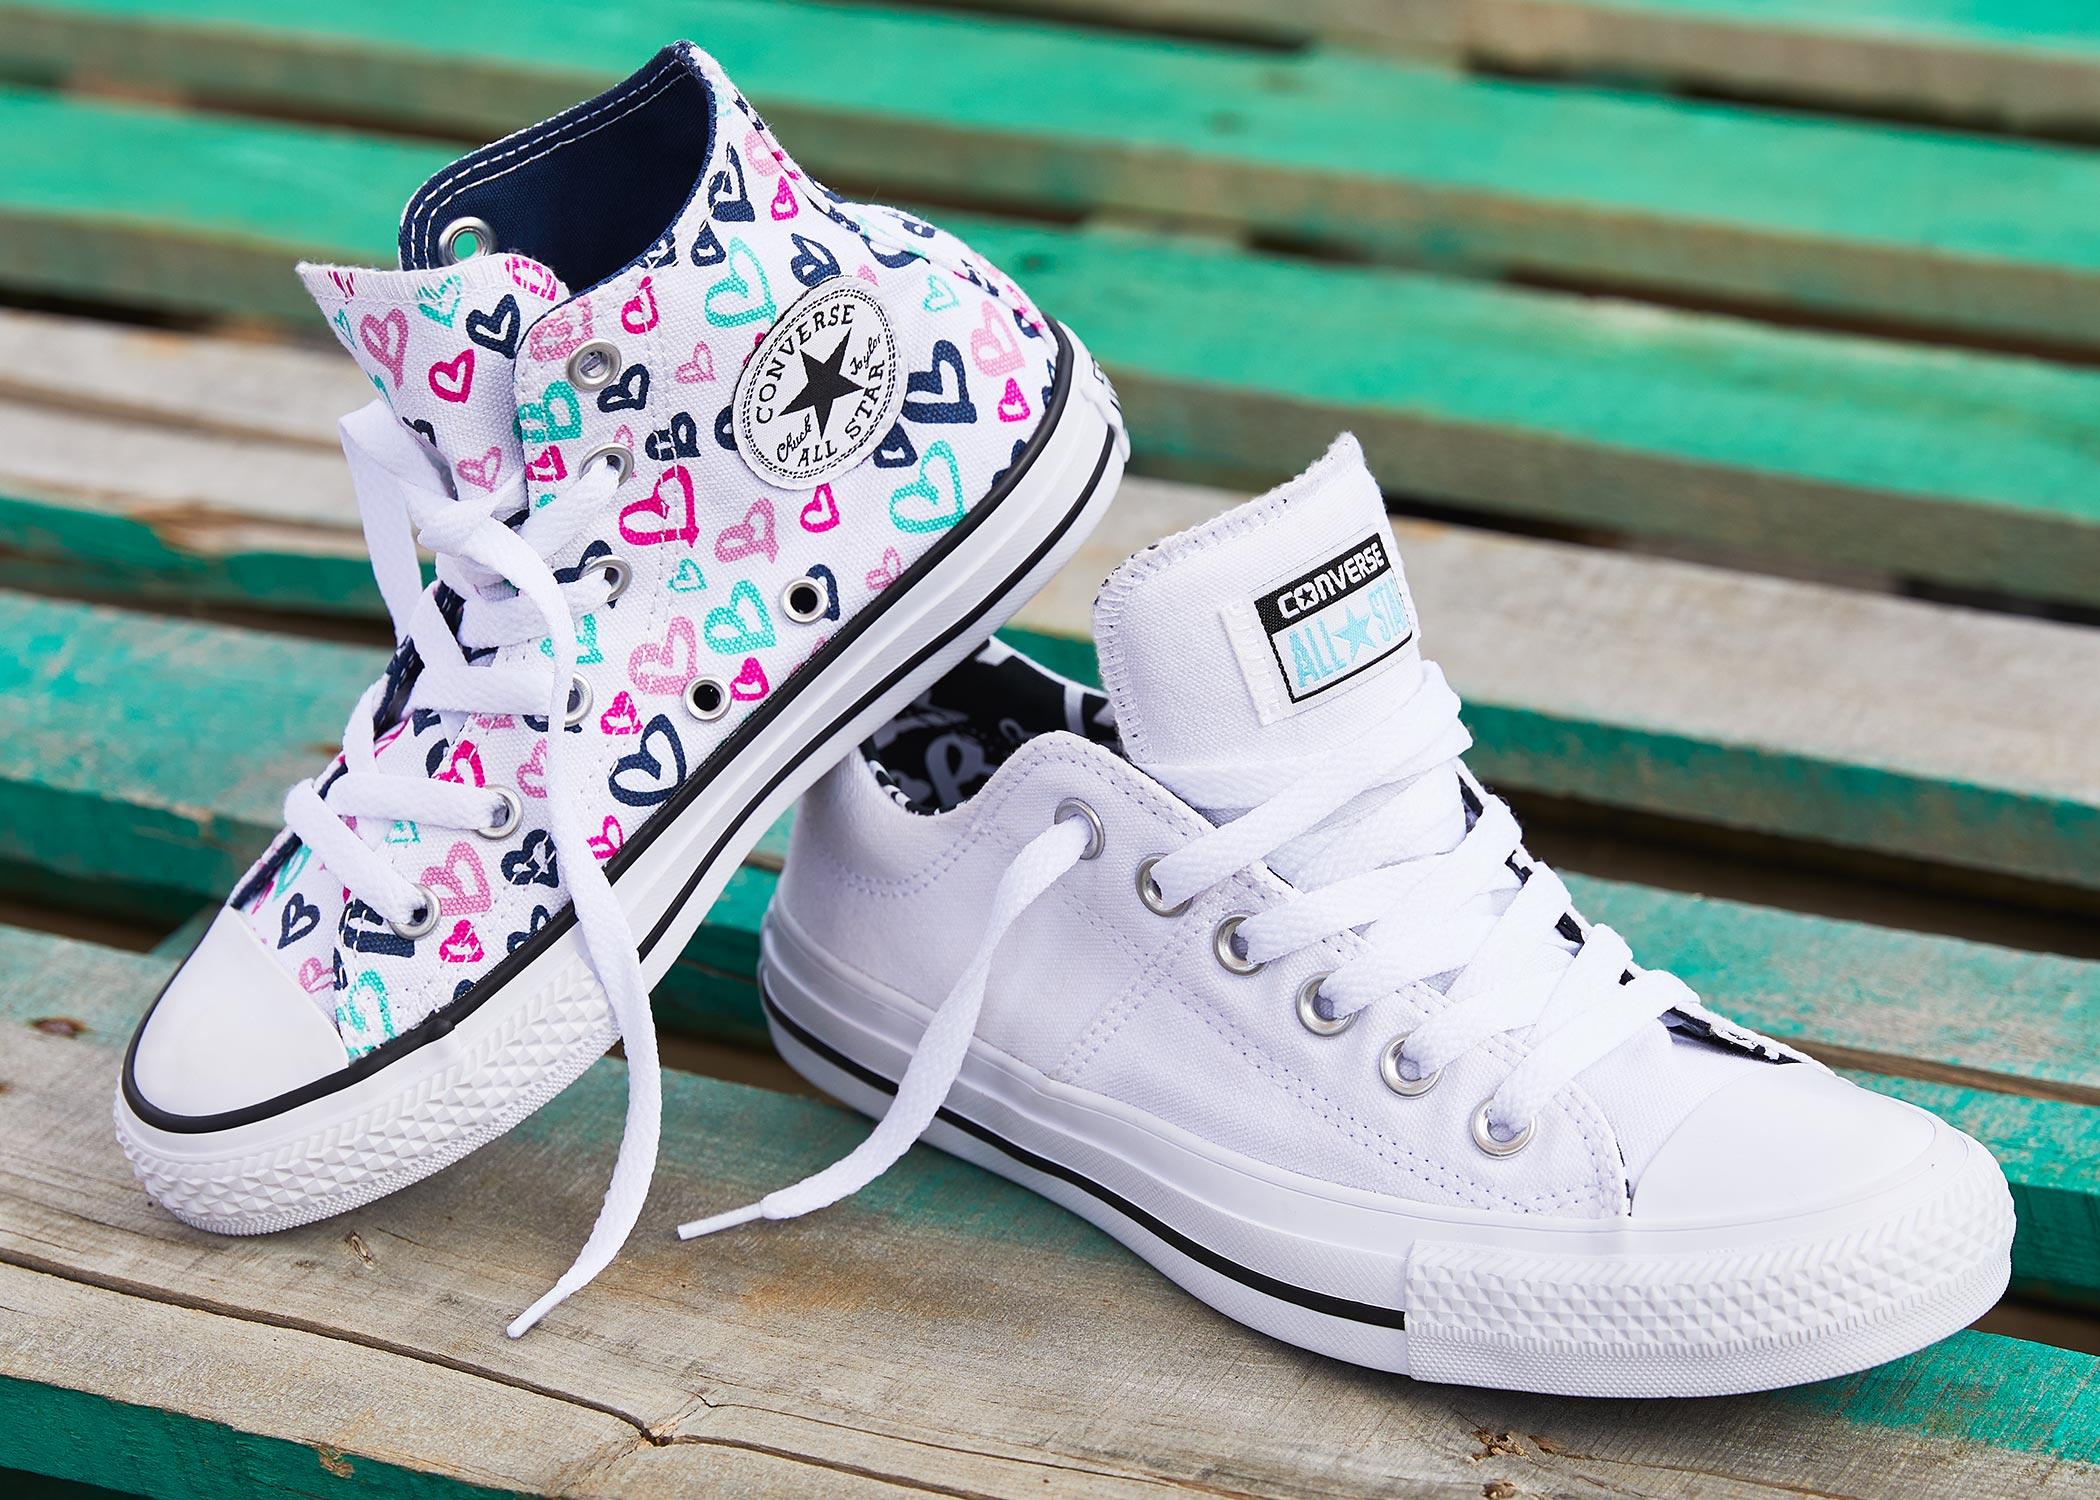 cute girls converse high top and a womens all star sneaker